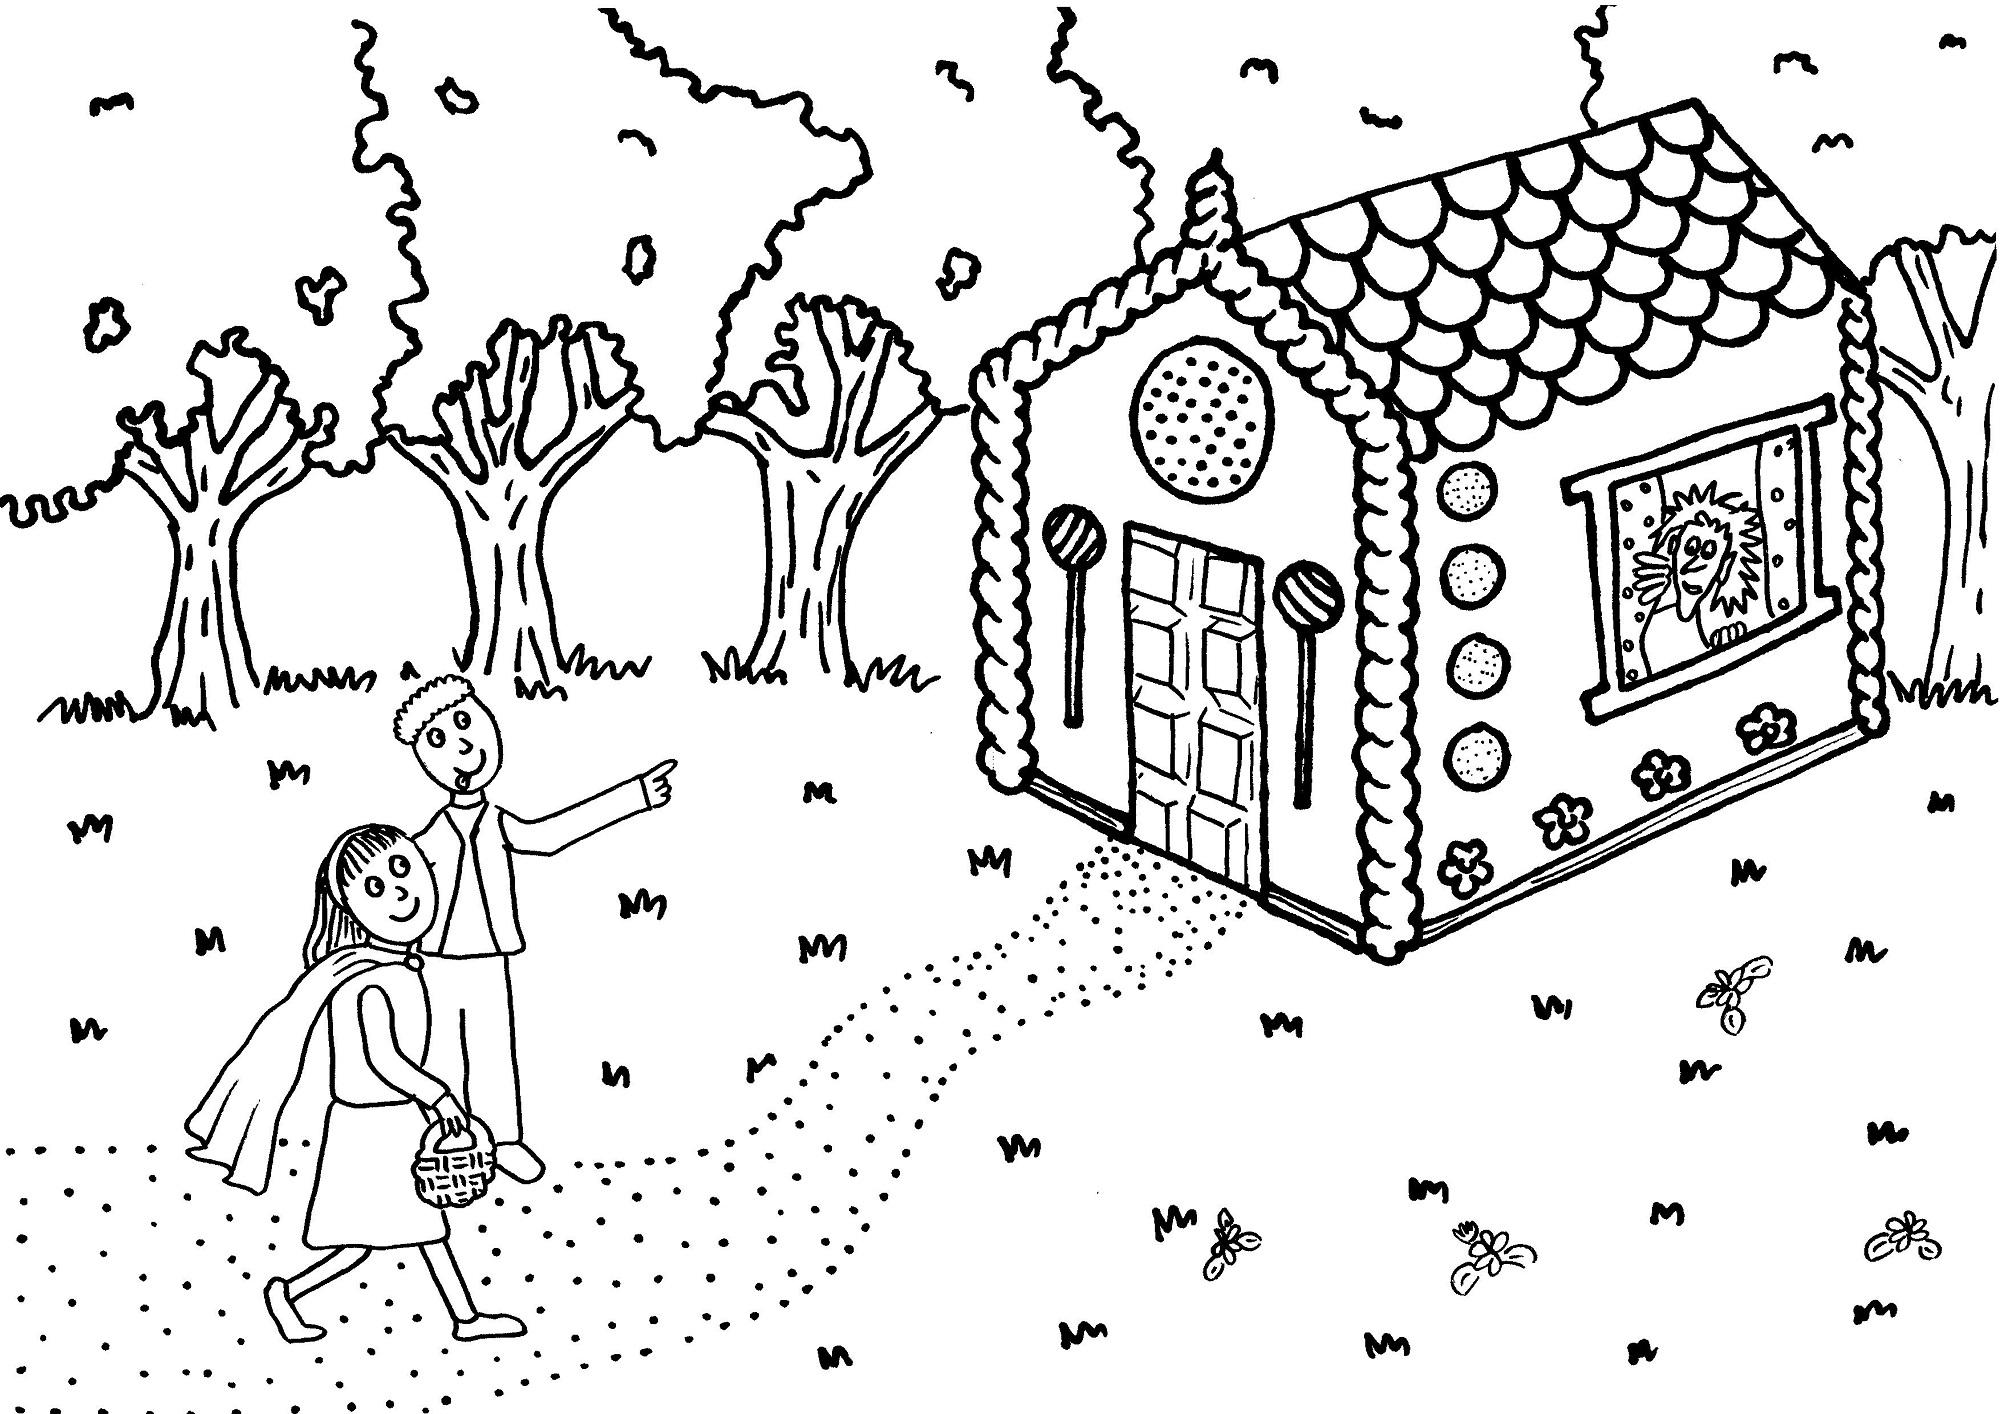 Hansel And Gretel Worksheets Cute | Kiddo Shelter | Hansel And Gretel Printable Worksheets